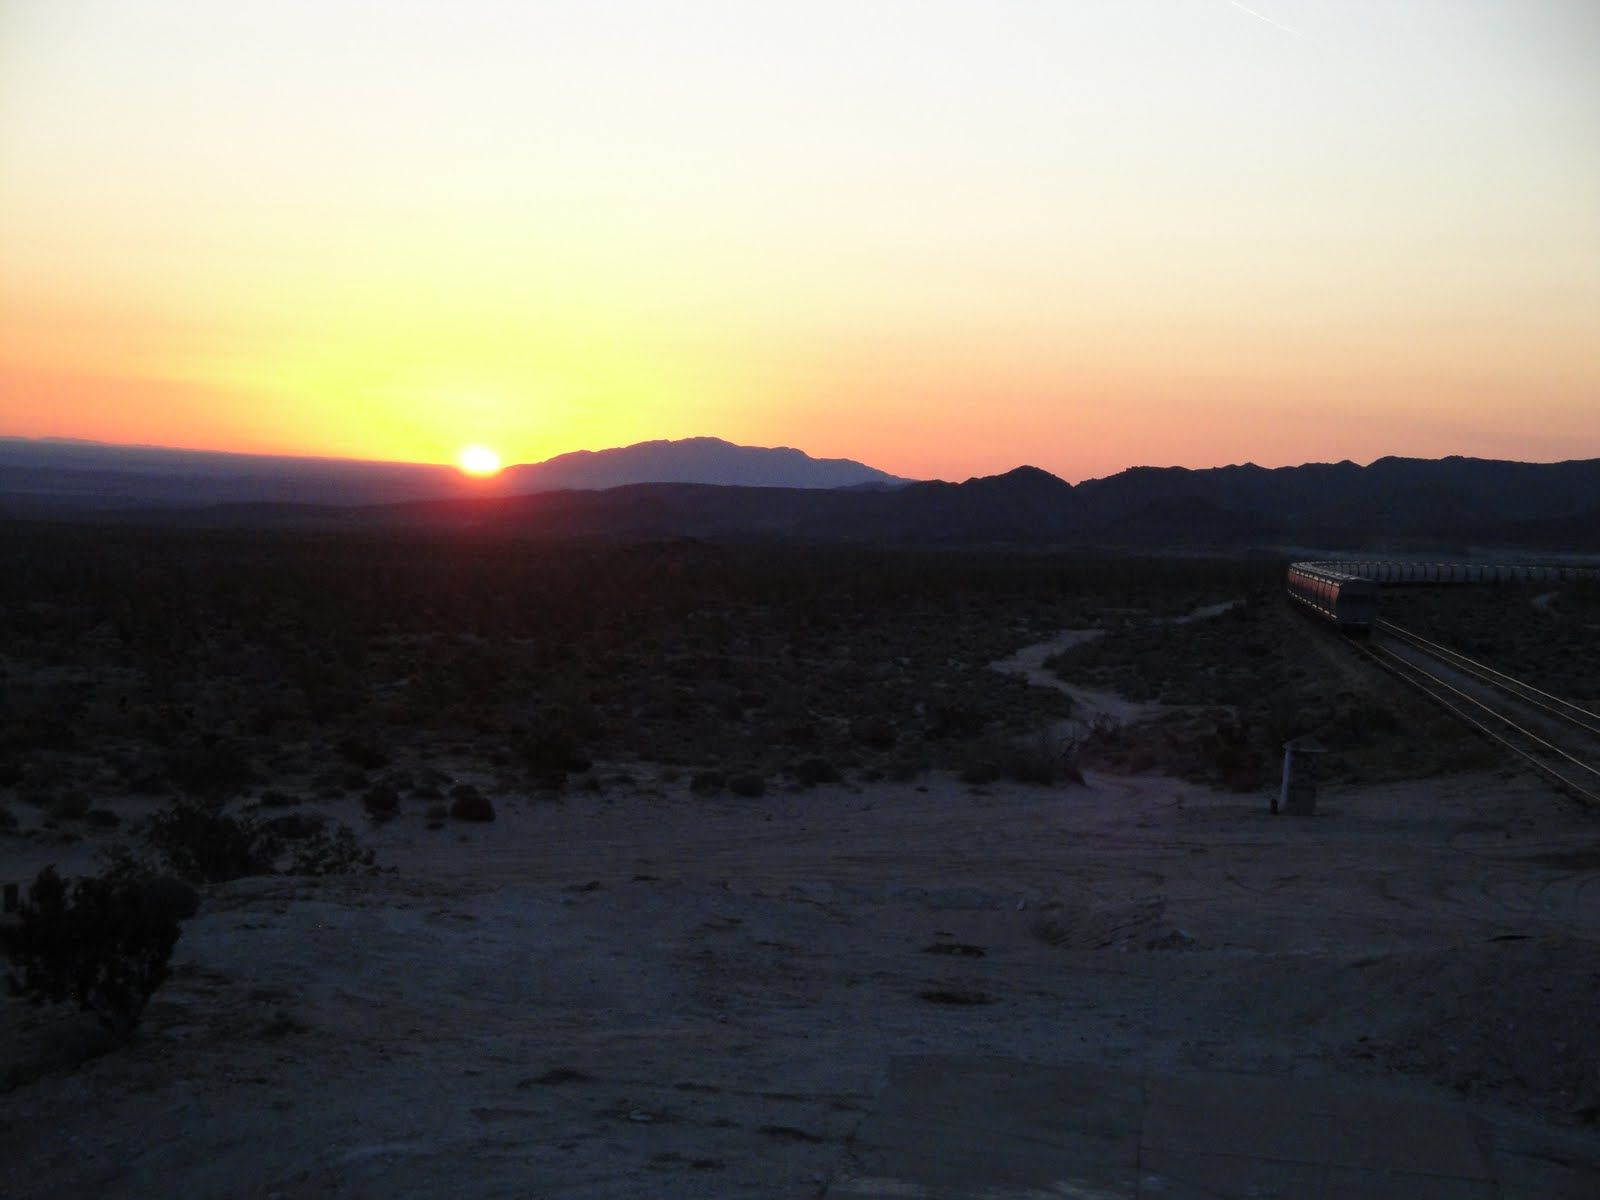 Linda's Anza Borrego Desert sunrise picture